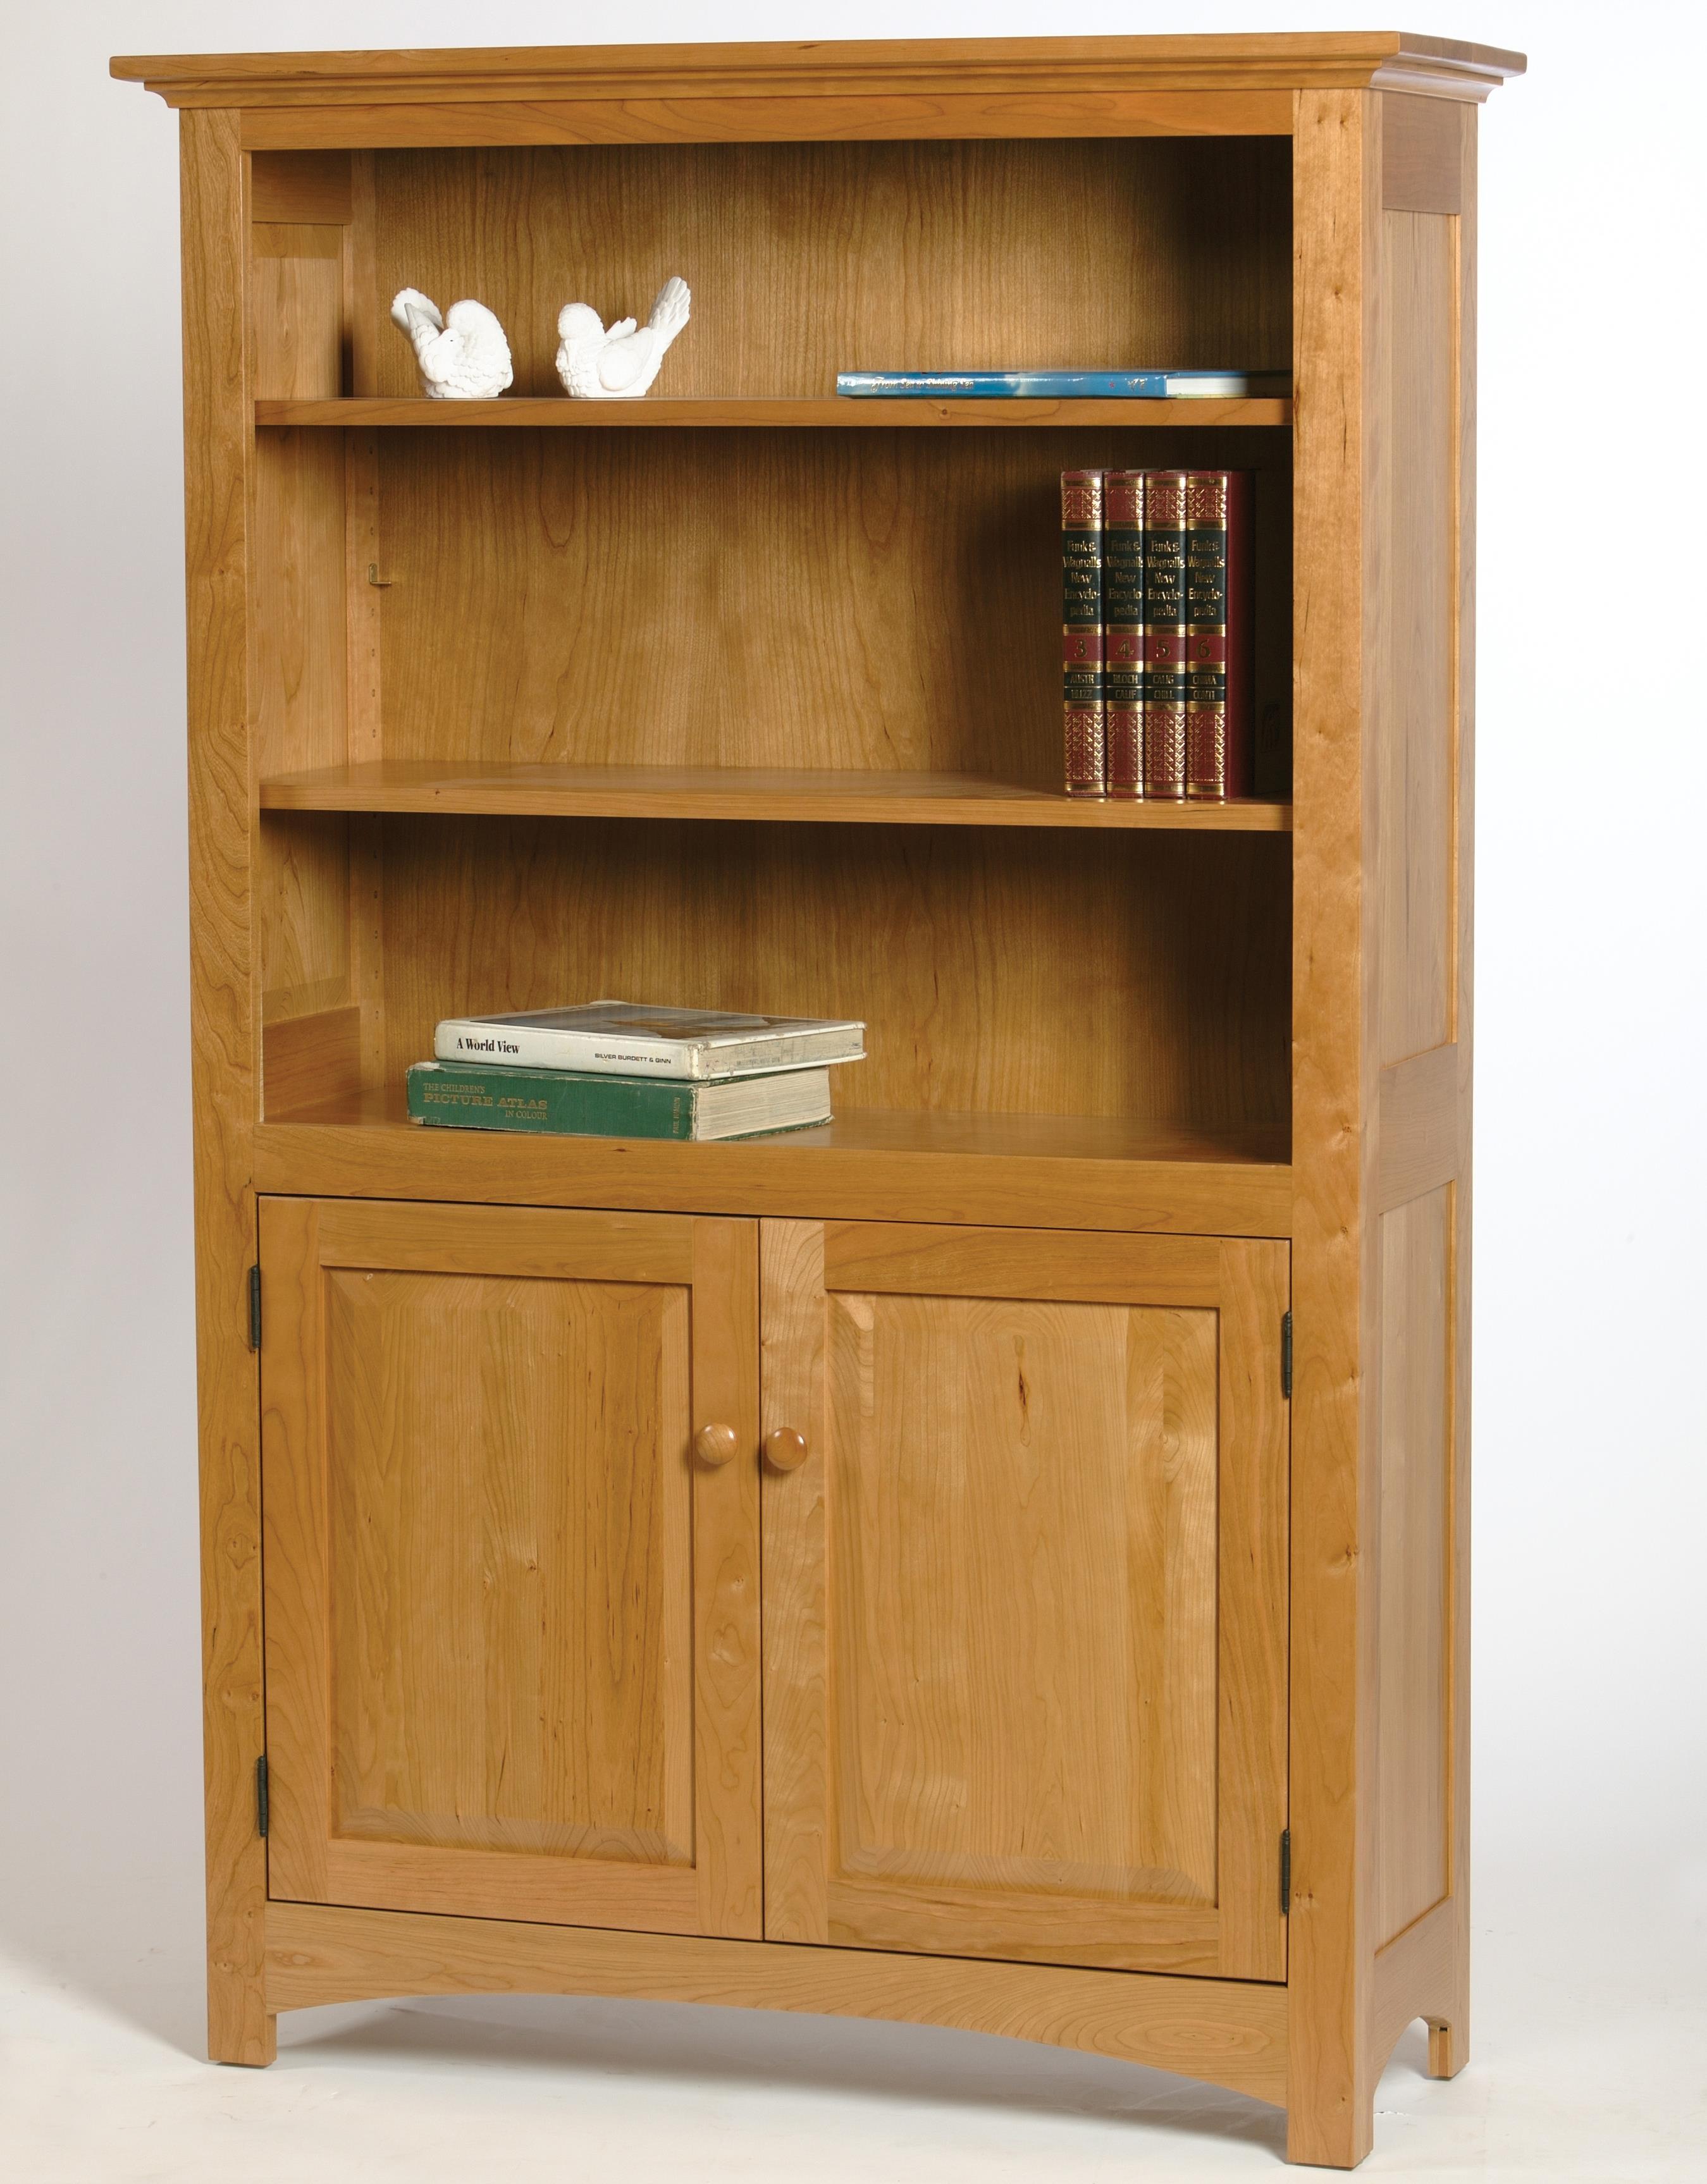 Wonder Wood Bookcases Customizable Prairie Bookcase by Wonder Wood at Saugerties Furniture Mart